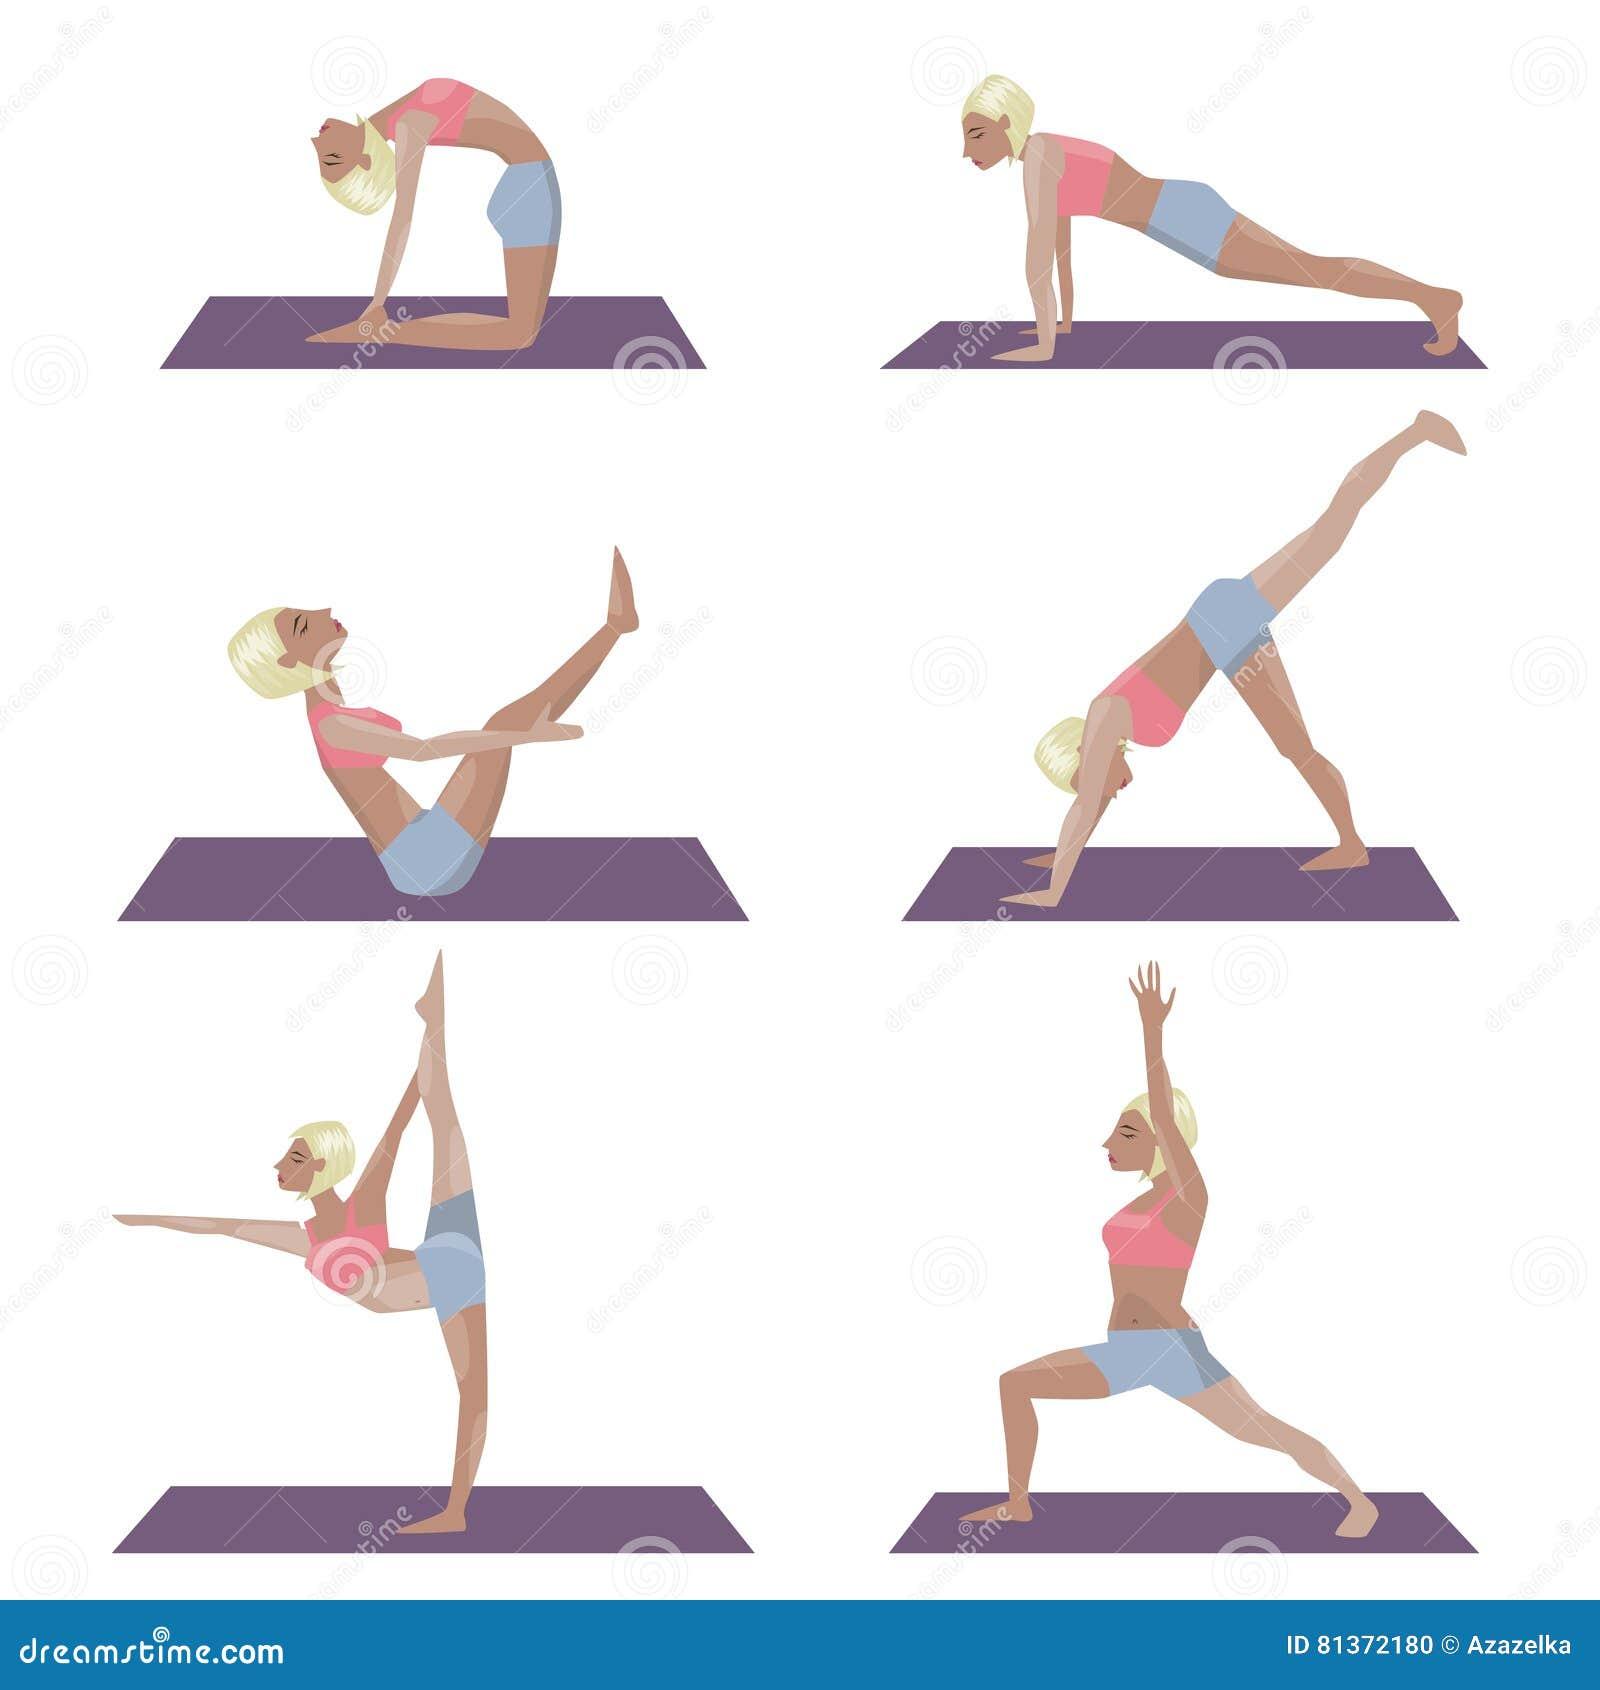 Set Of Template With Blonde Girl Doing Yoga Exercises Good For Yoga Studio Yoga Class Yoga Center Stock Vector Illustration Of Asana Background 81372180